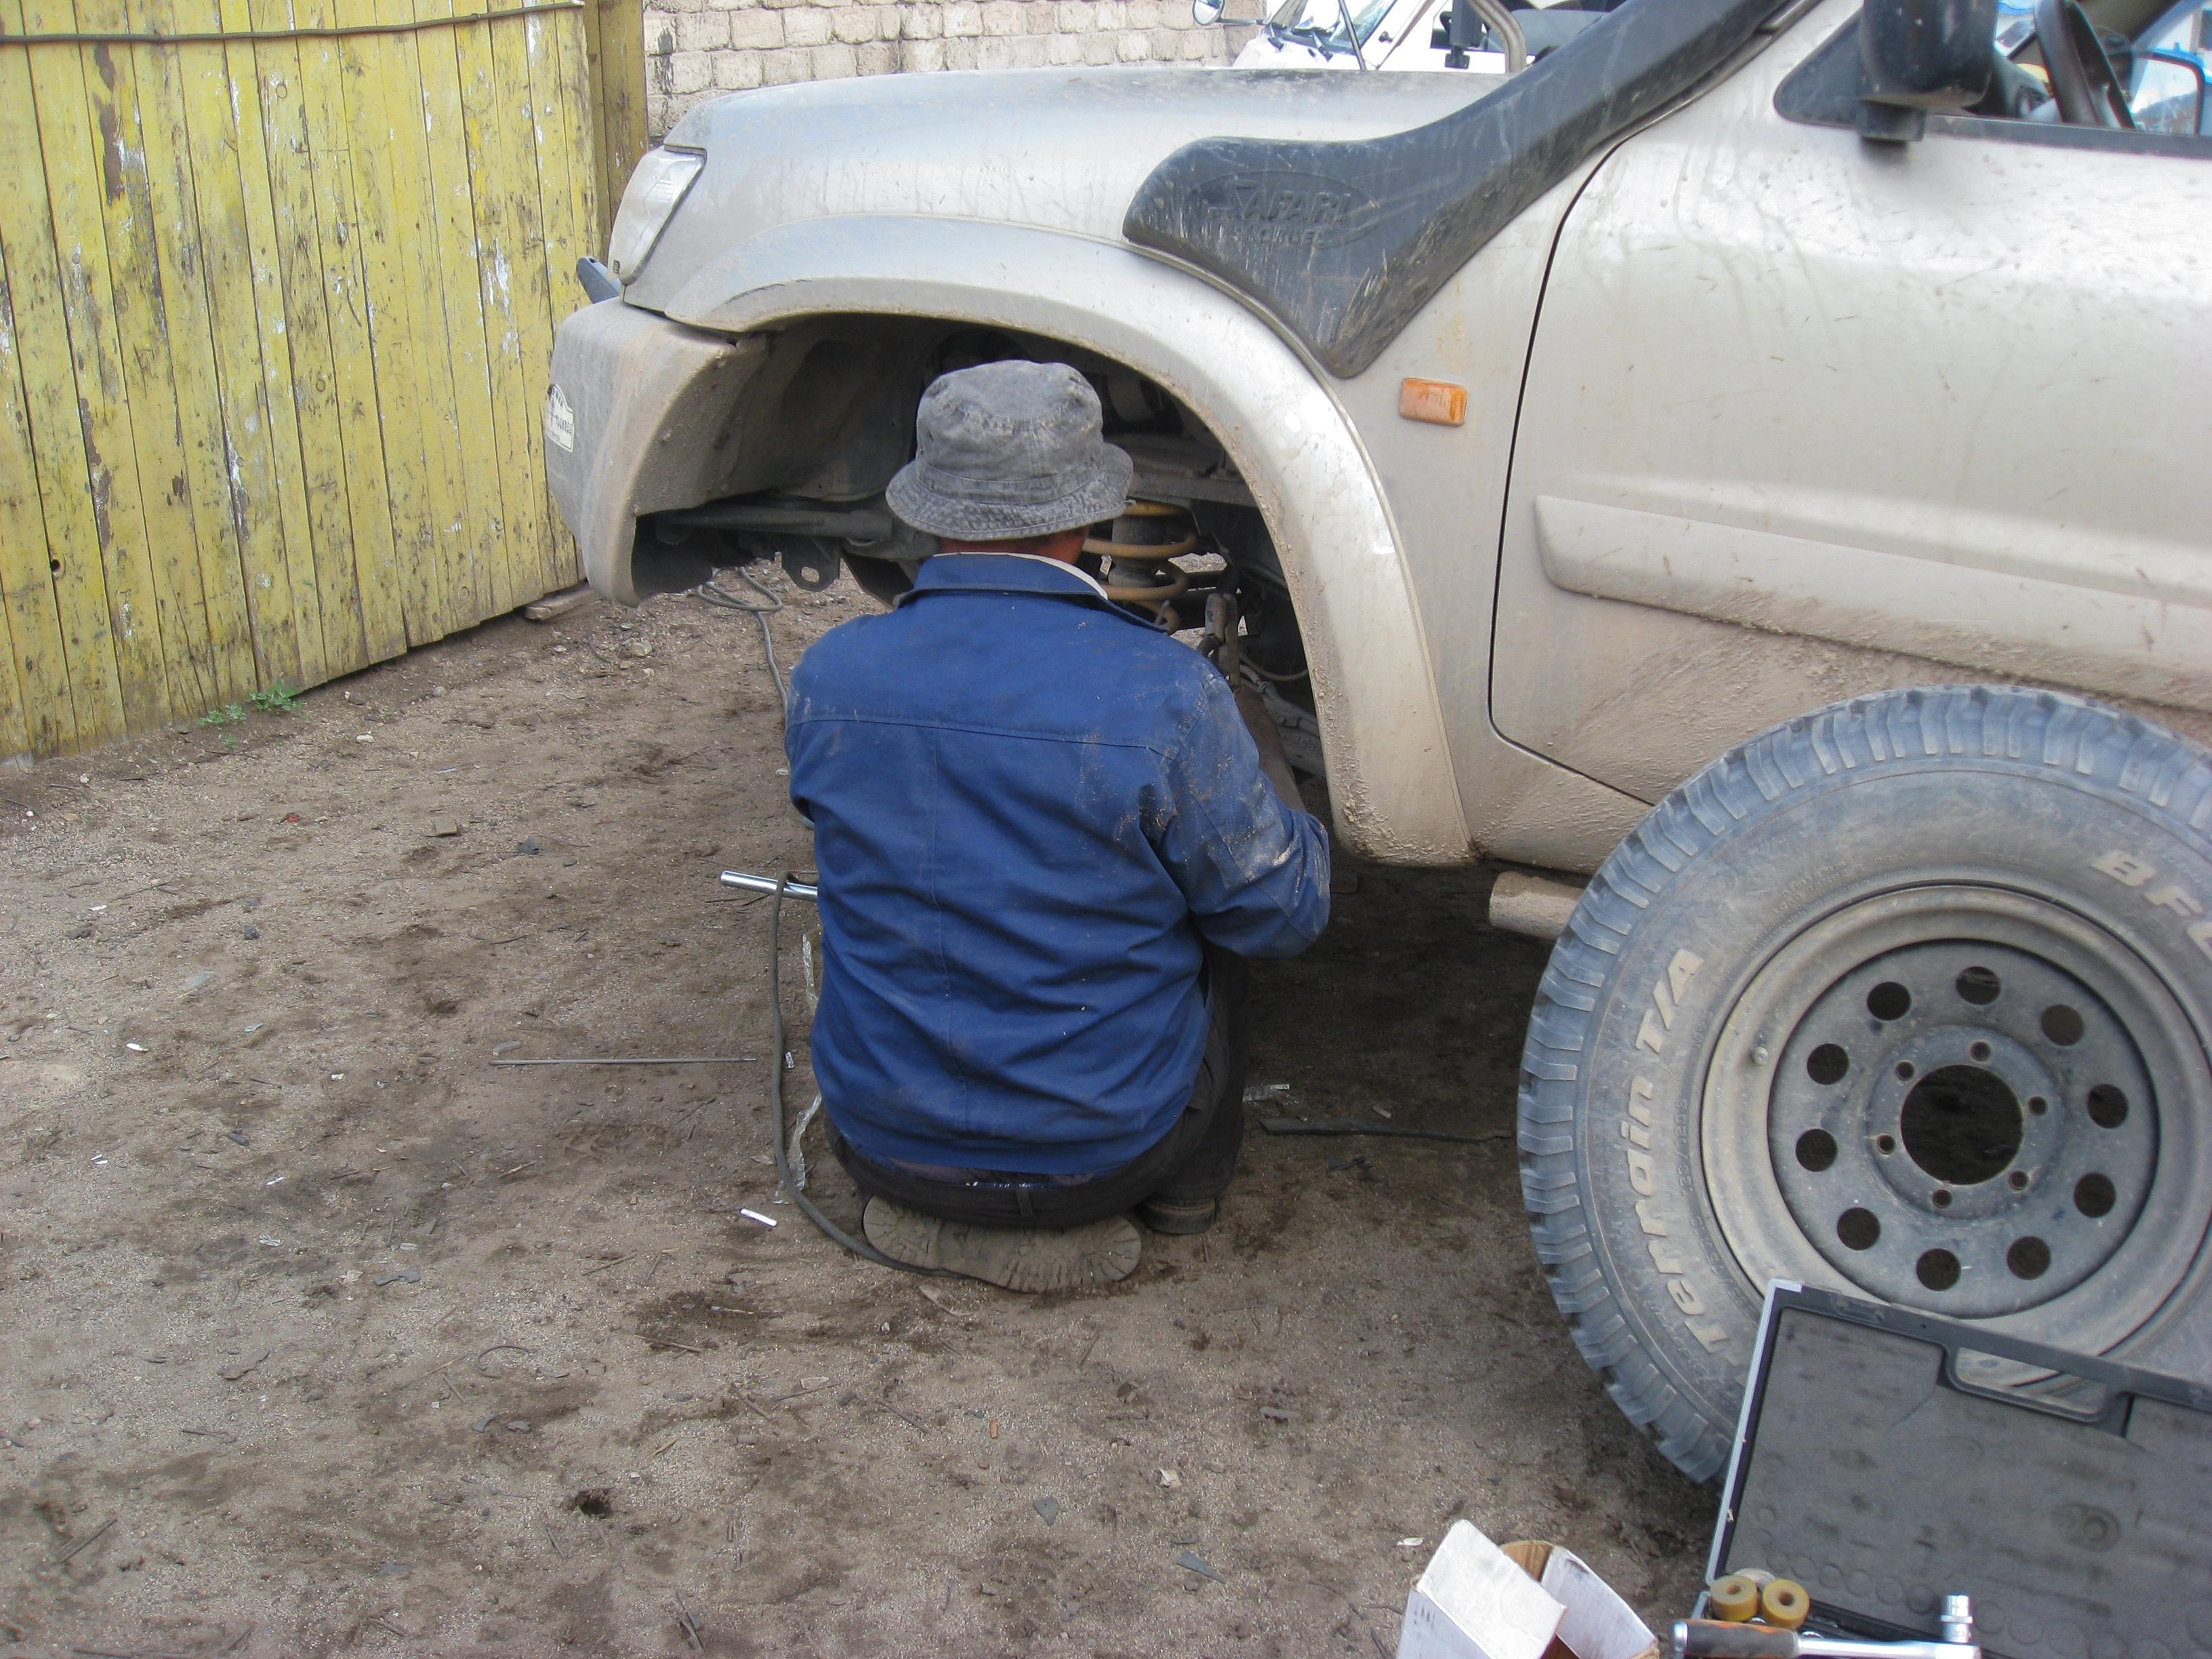 Free Images : Wheel, Jeep, Garage, Bumper, Rim, Mongolia, Car Breakdown,  City Car, Off Road Vehicle, Sport Utility Vehicle, Automobile Make, ...